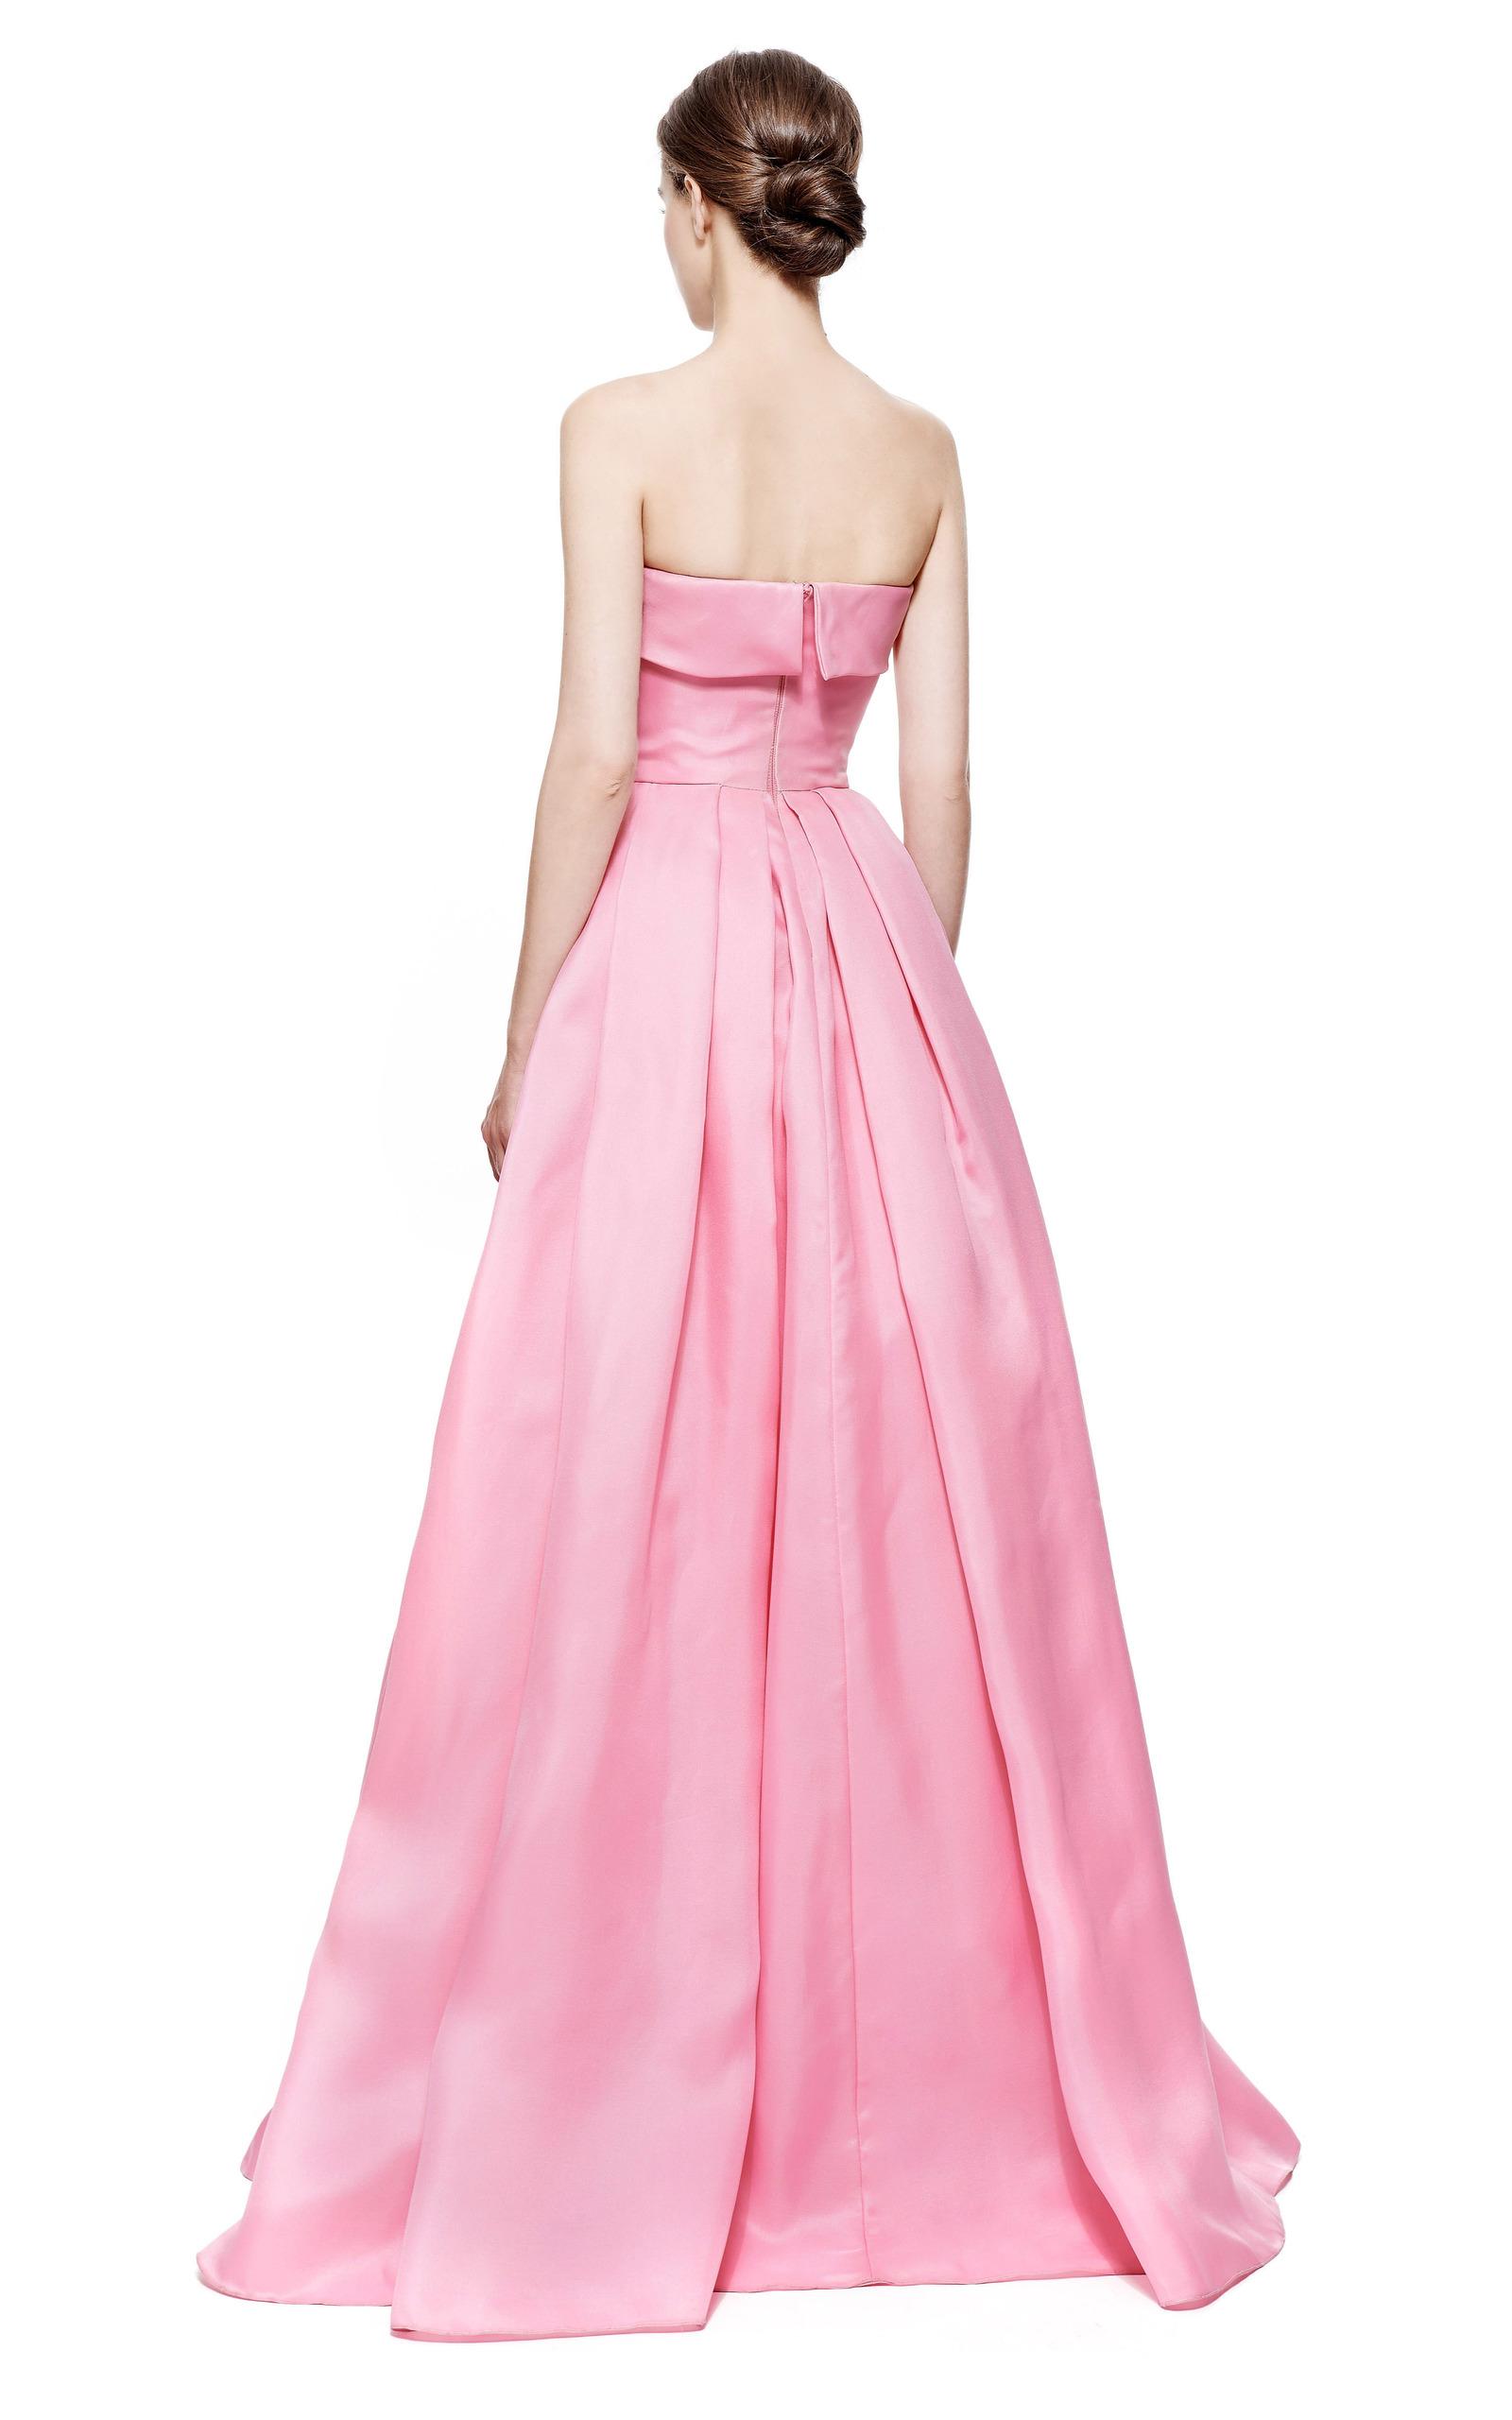 83ae88c743 Reem AcraReem Acra Strapless Silk Gazar Pleated Ball Gown. CLOSE. Loading